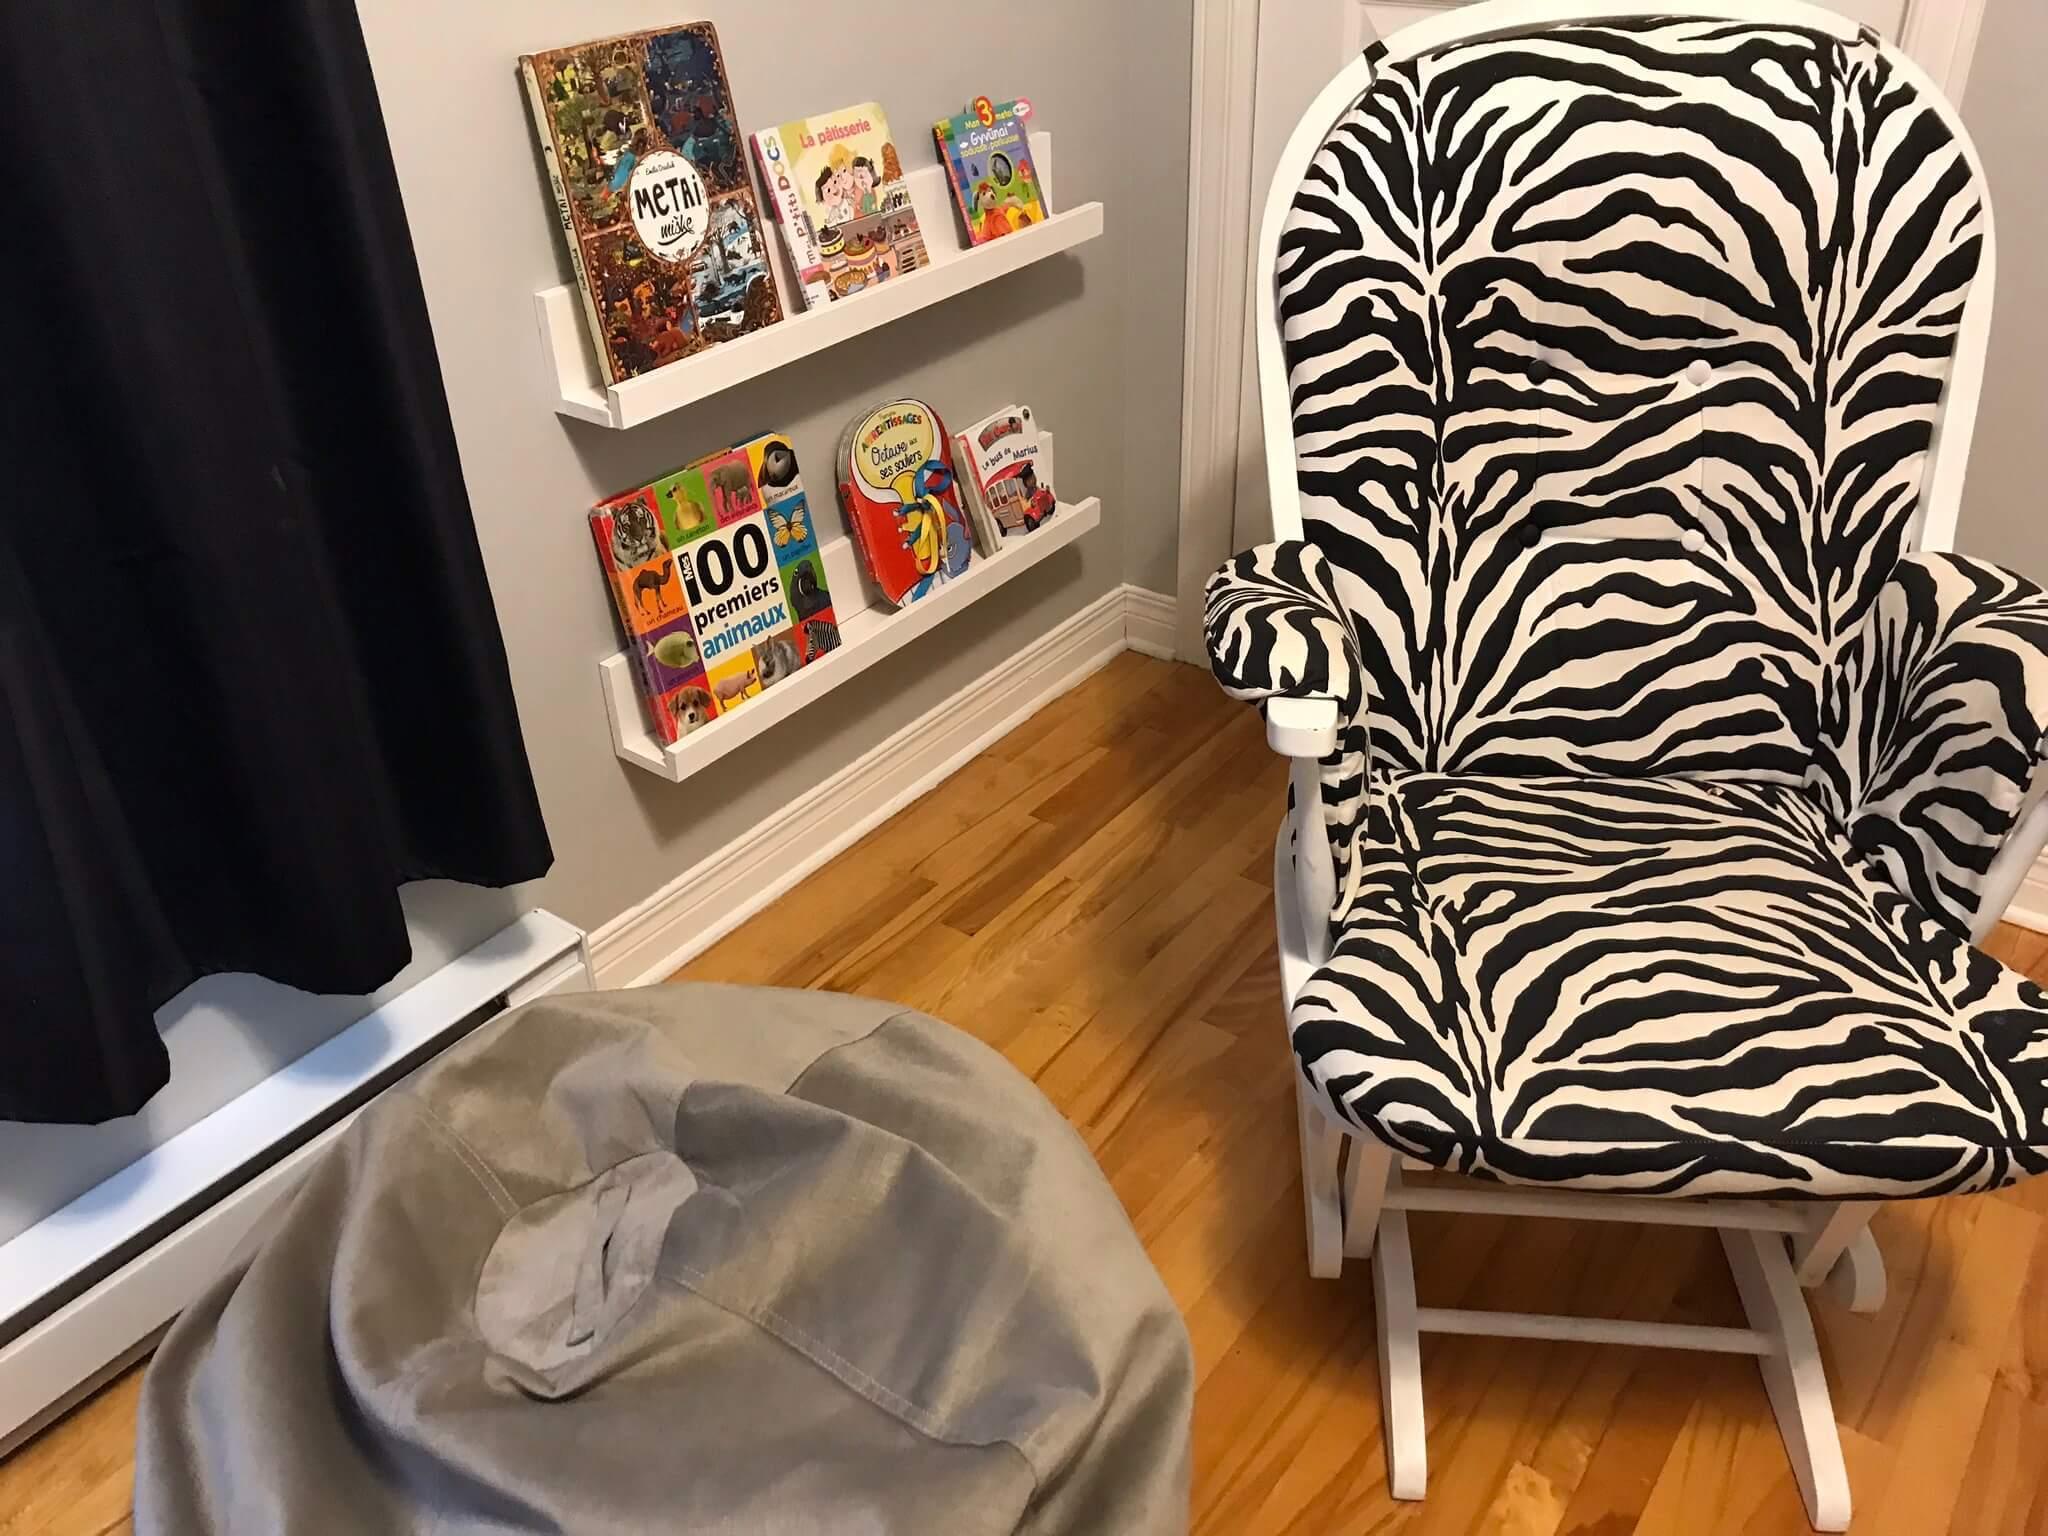 Coin lecture Montessori afin de relaxer avant de se coucher.